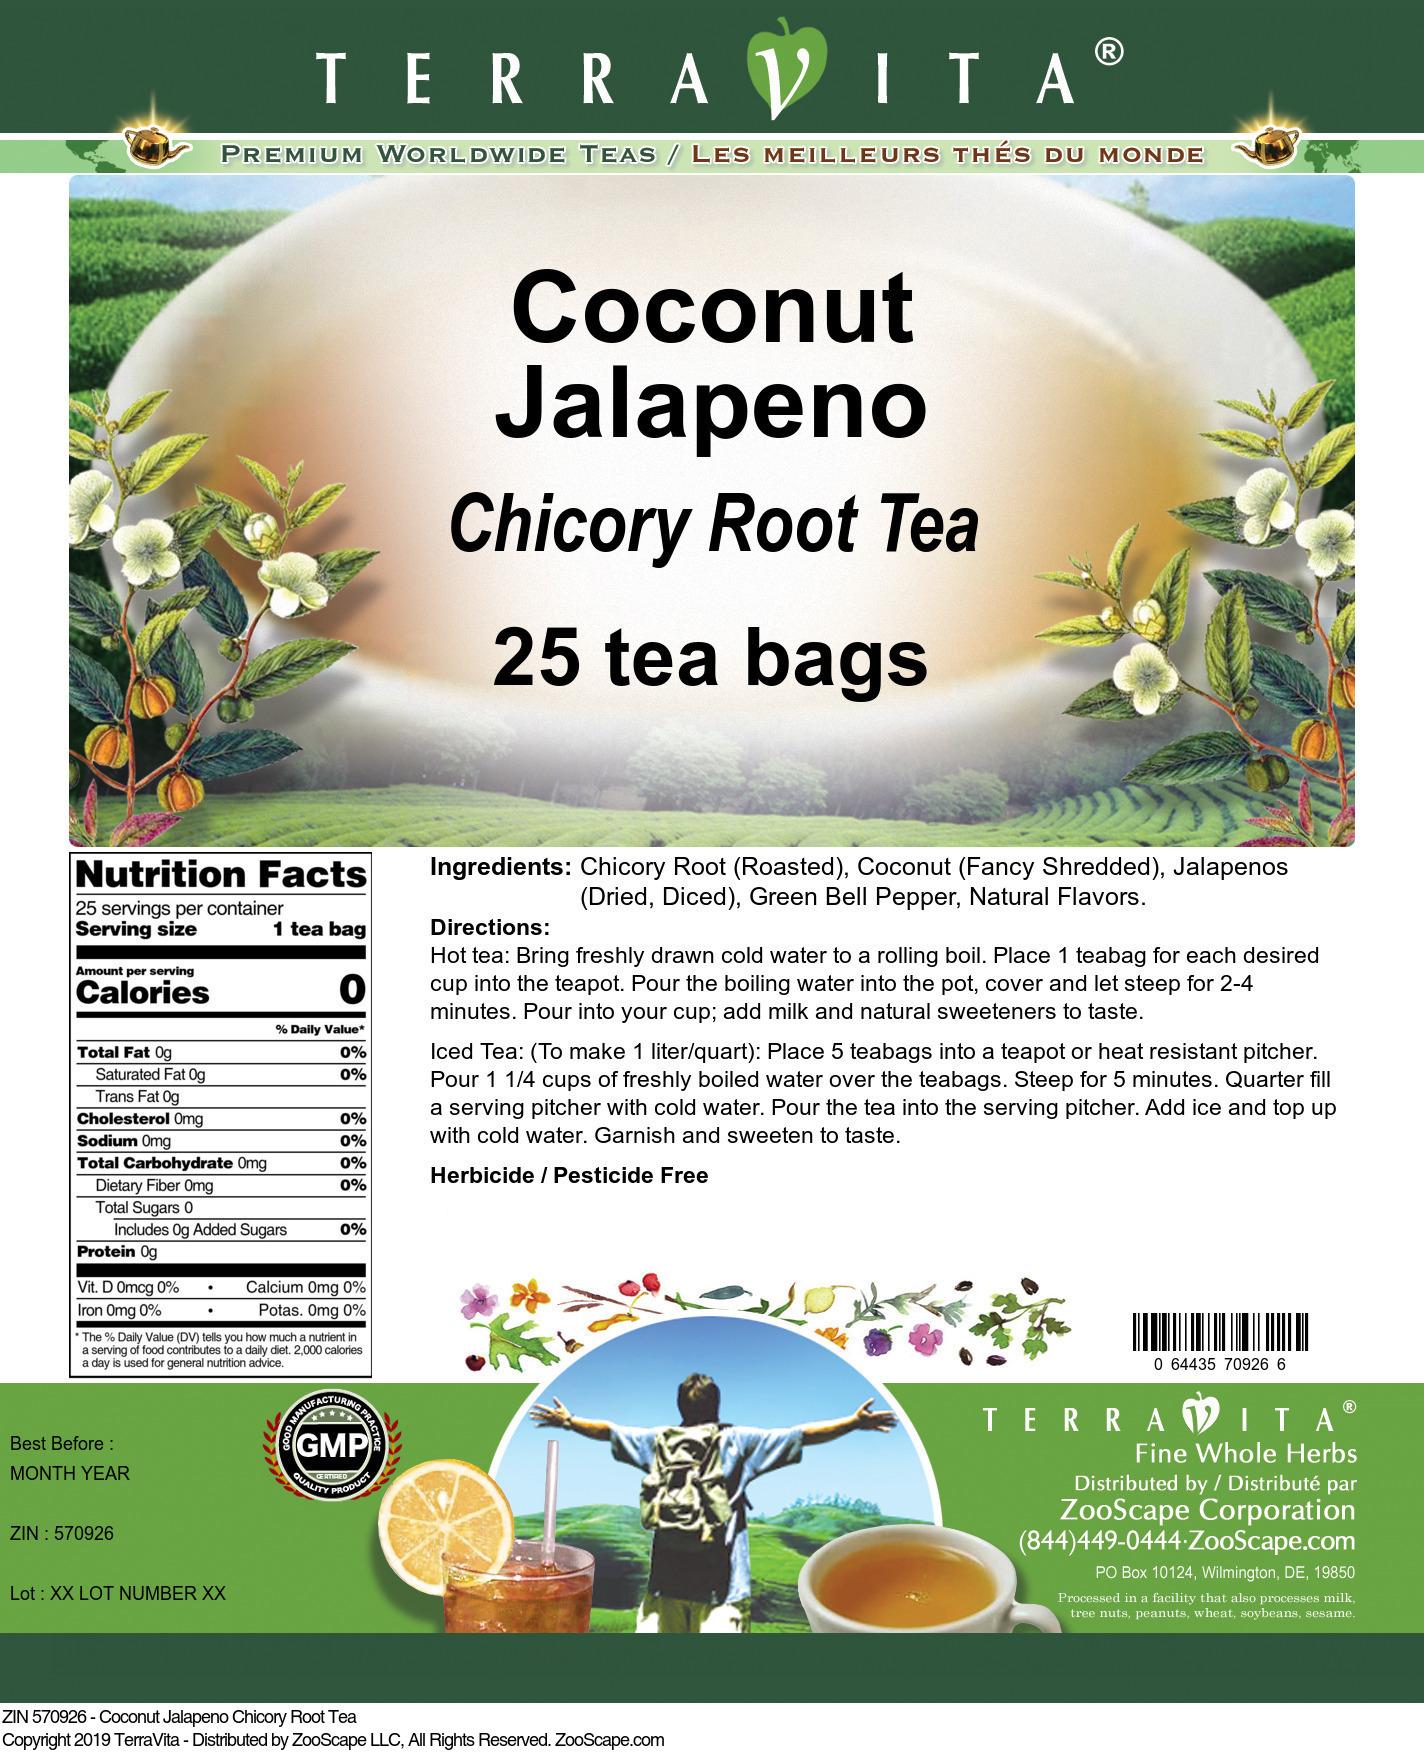 Coconut Jalapeno Chicory Root